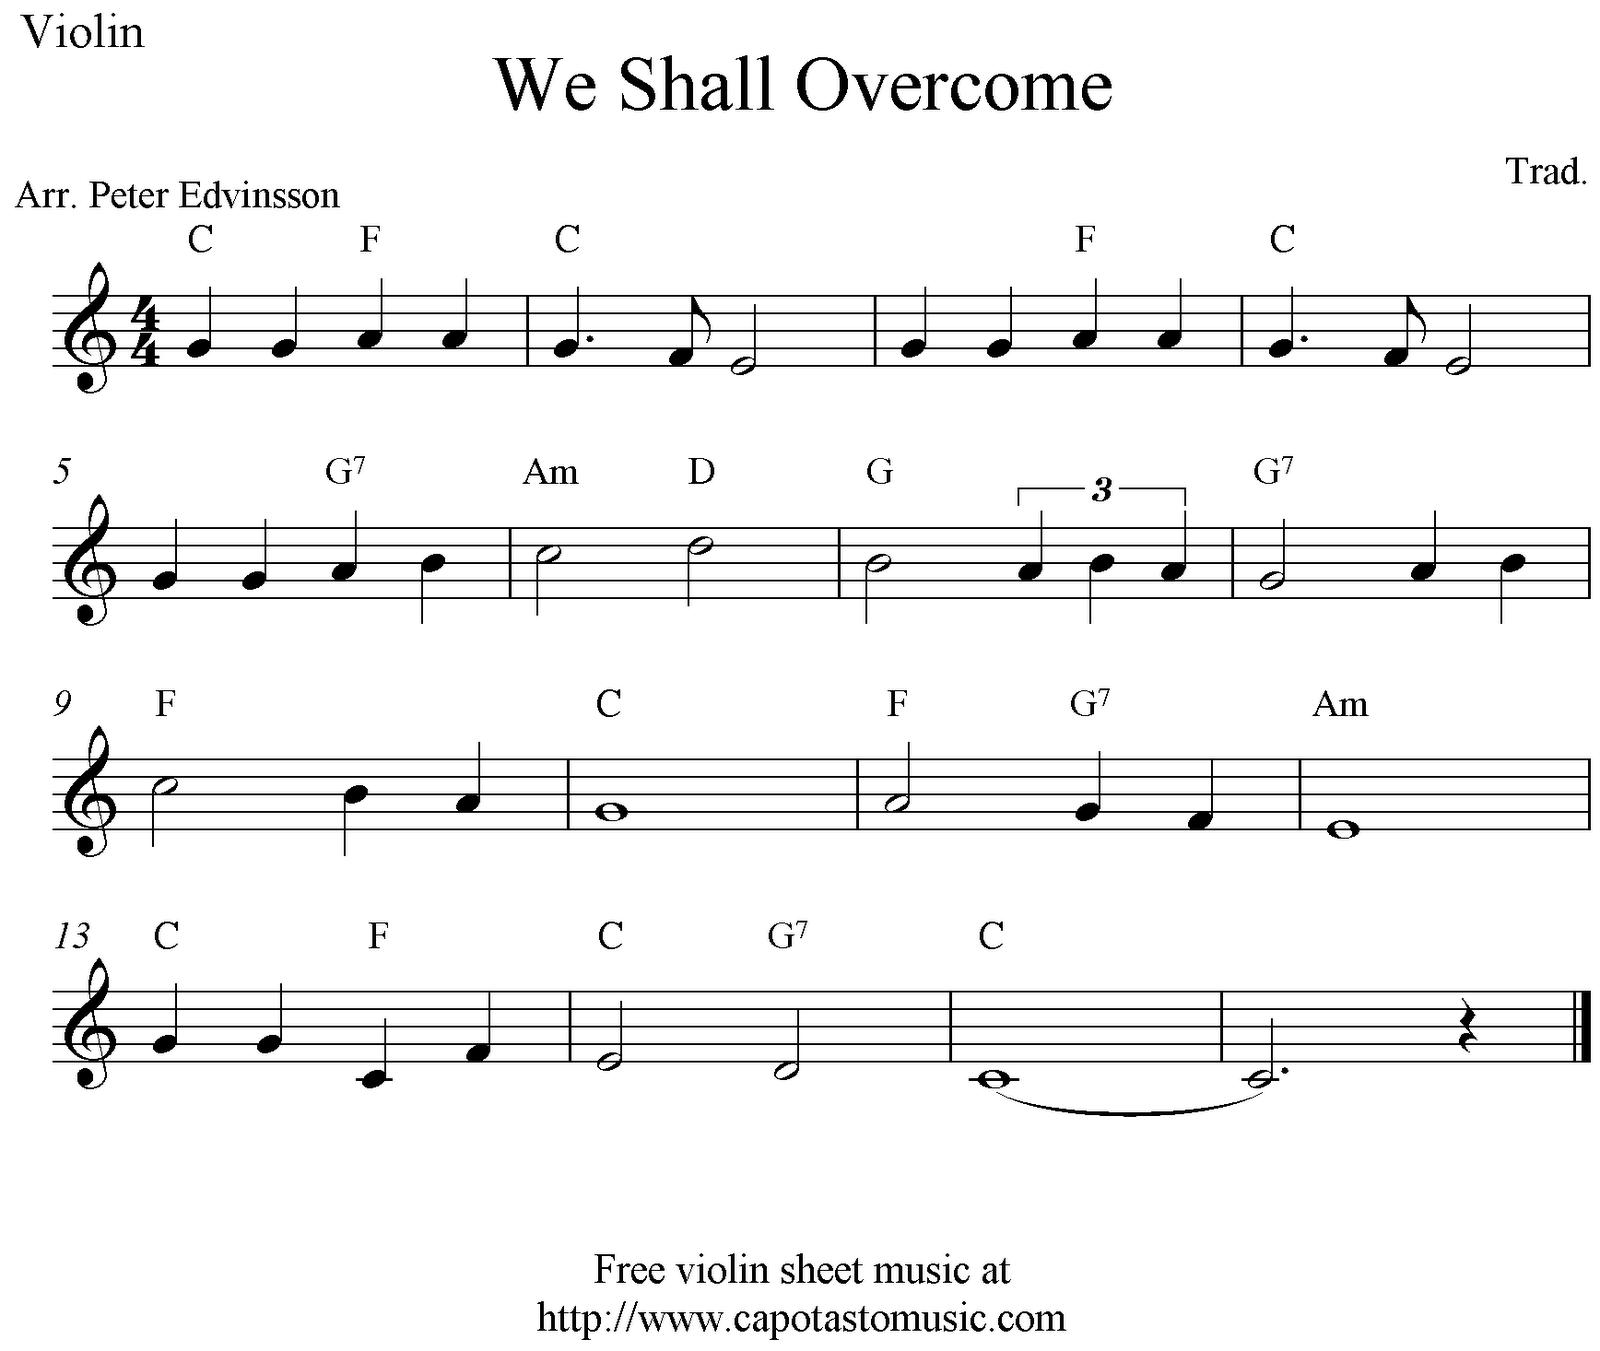 Free Christmas Violin Sheet Music O: We Shall Overcome, Free Violin Sheet Music Notes